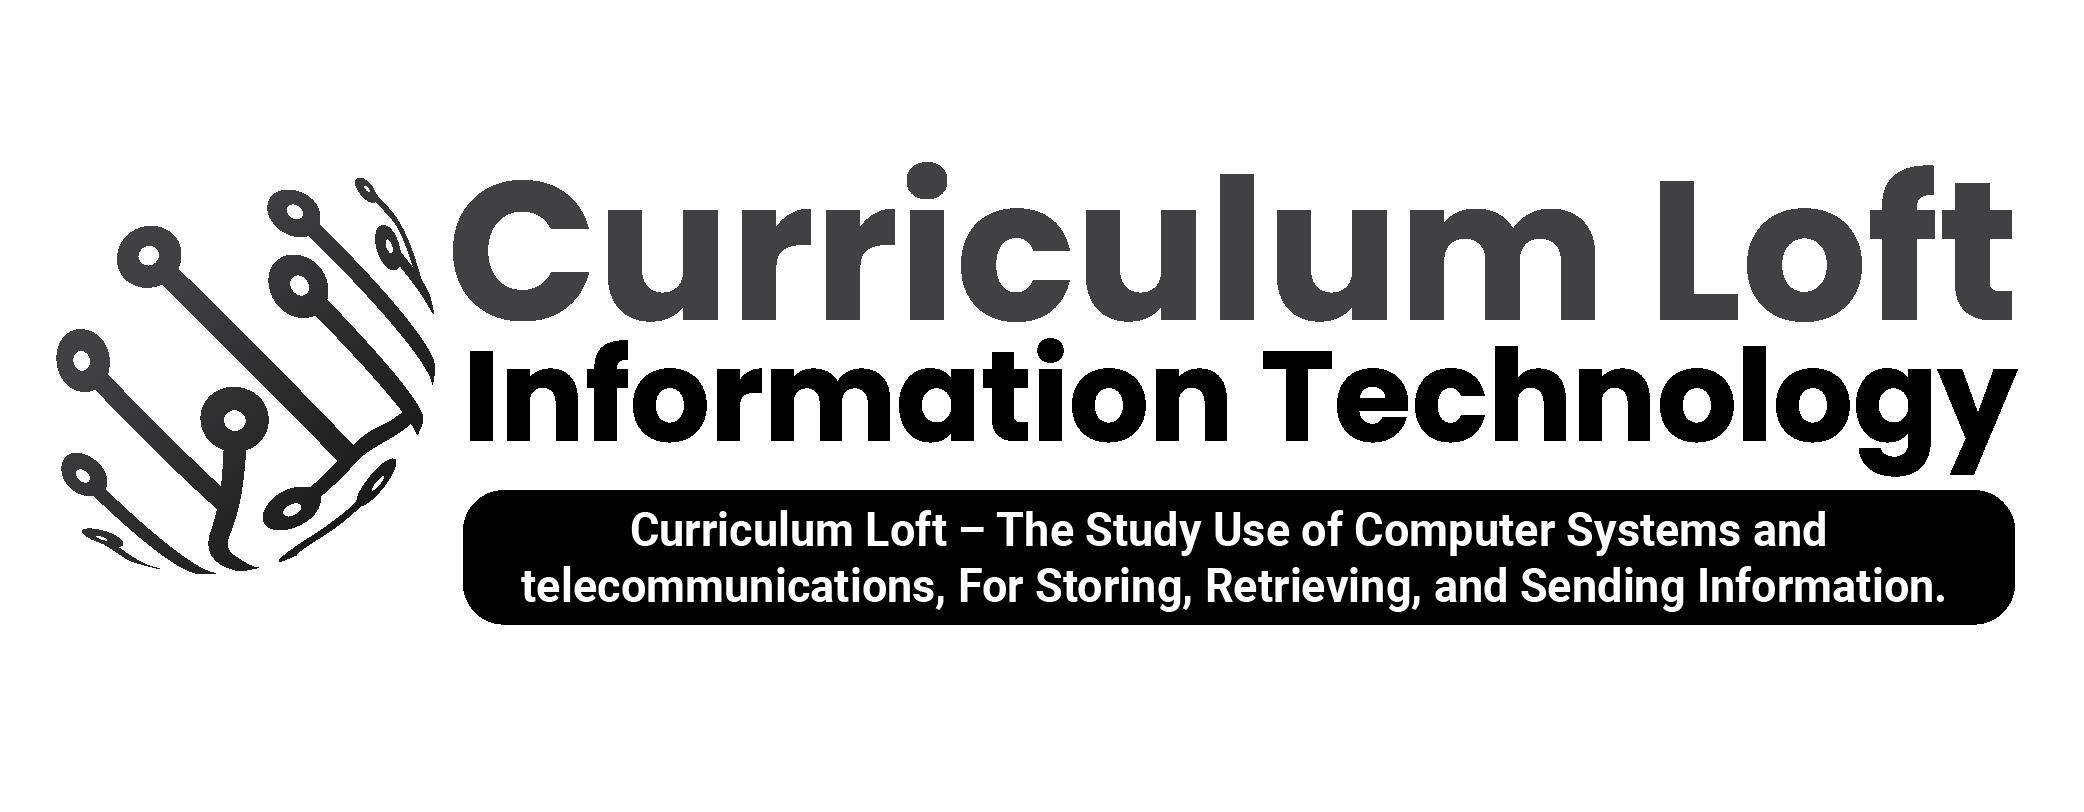 Curriculum Loft – Information Technolgy